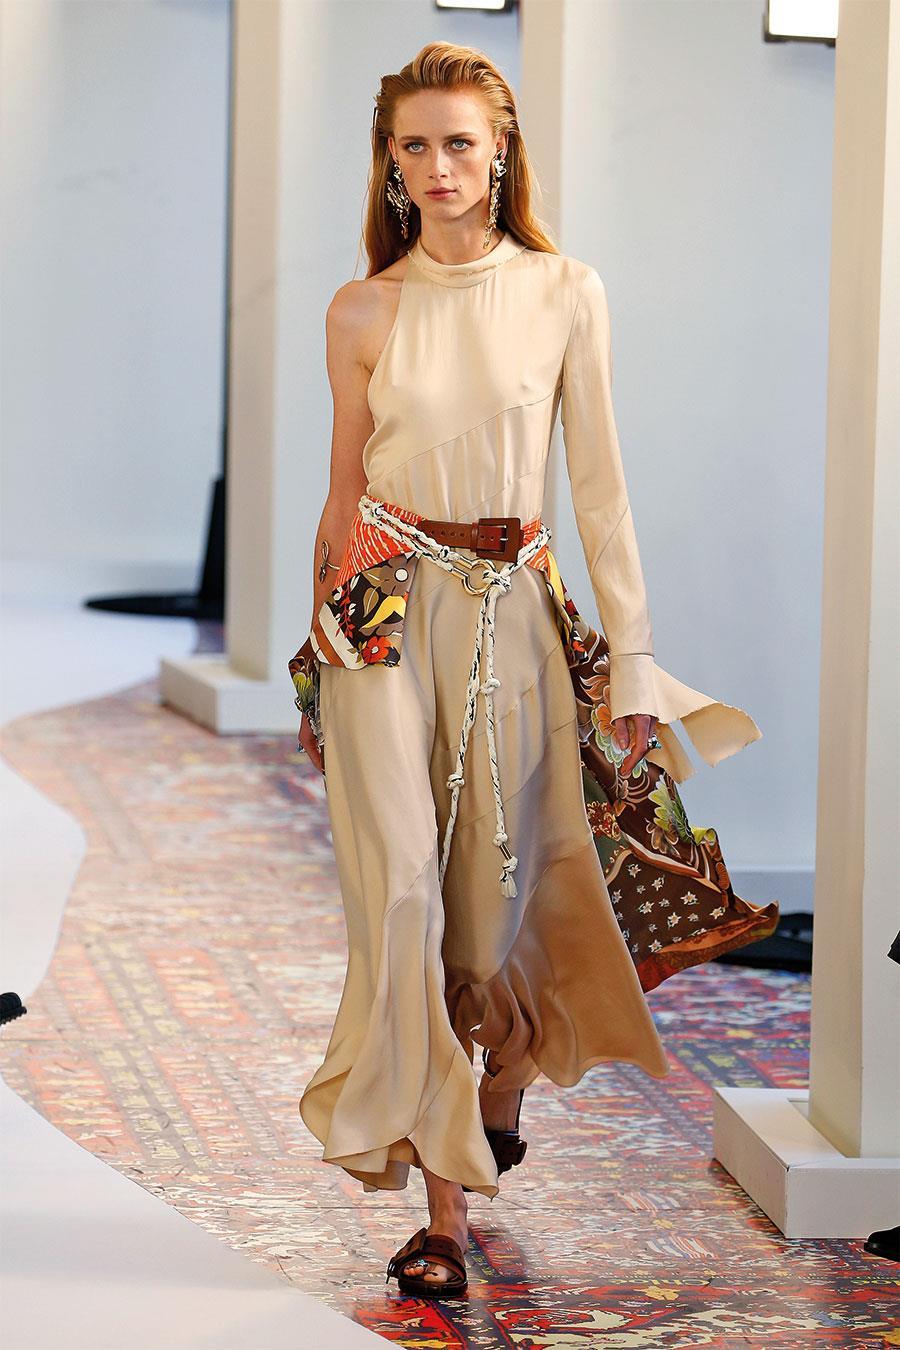 b2e337113d78 Moda primavera verano 2019 mujer: ropa años 80, ropa casual y ...